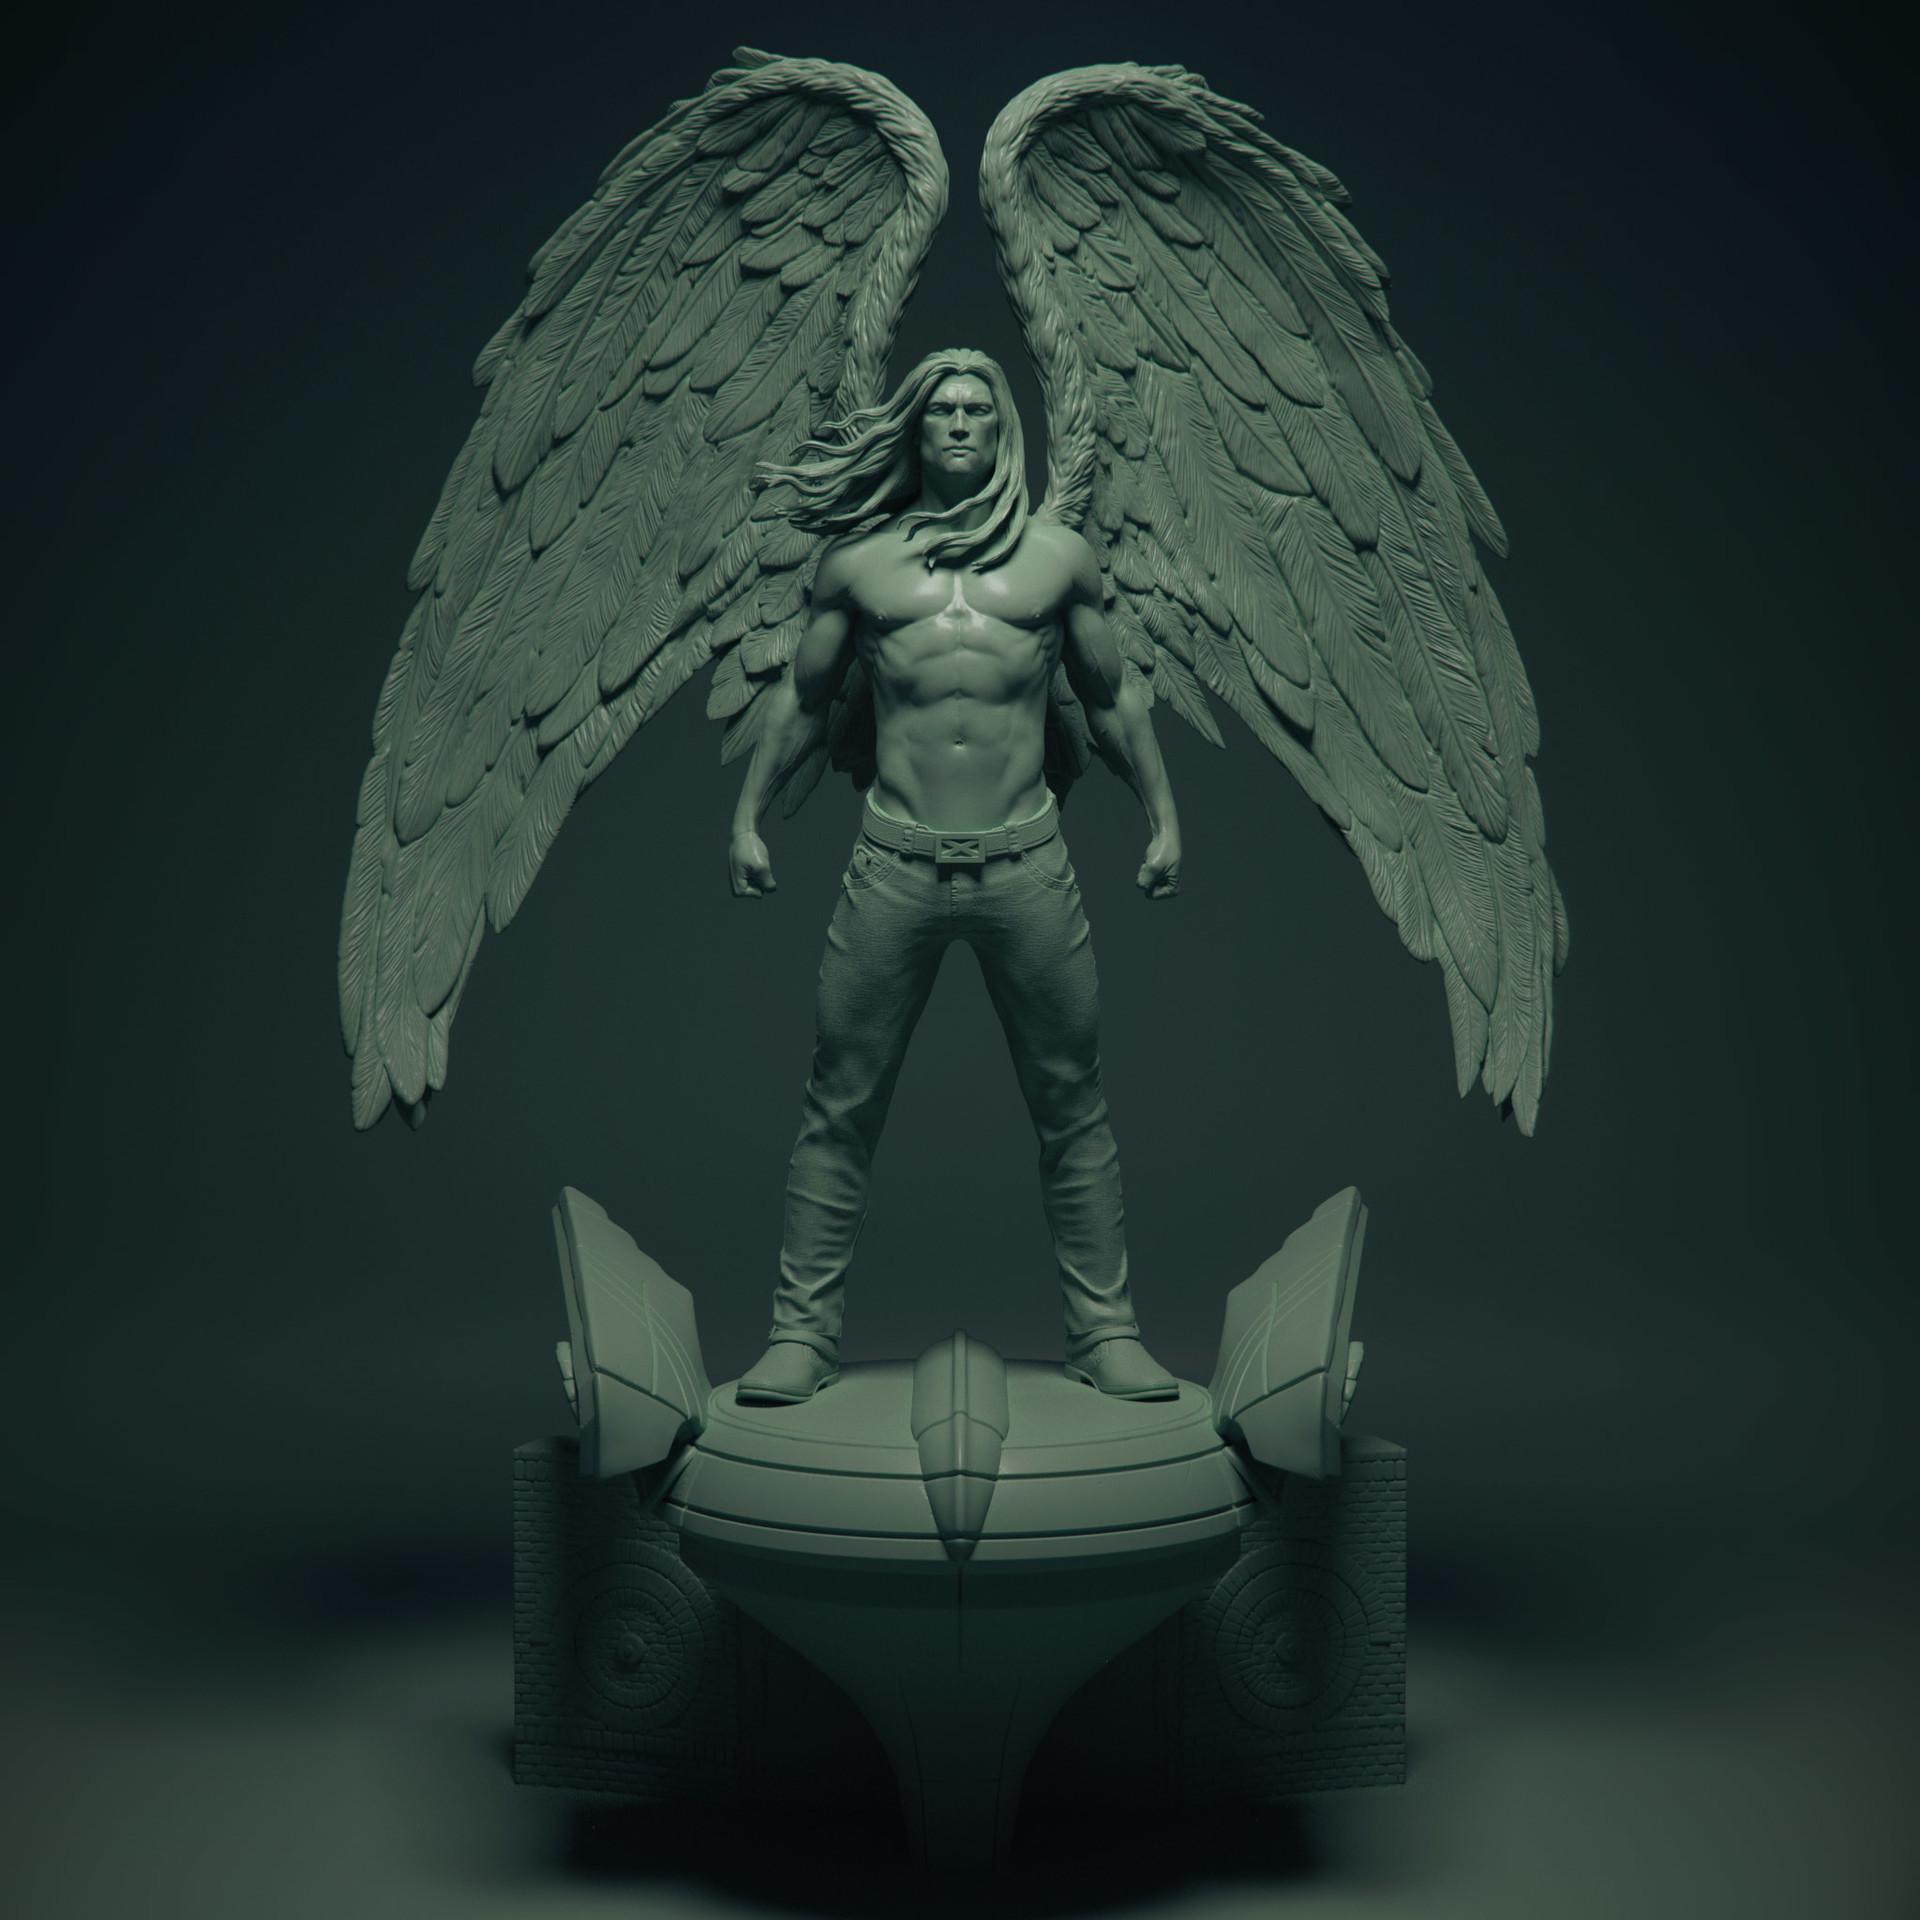 Franco carlesimo angelwips 0198 00000